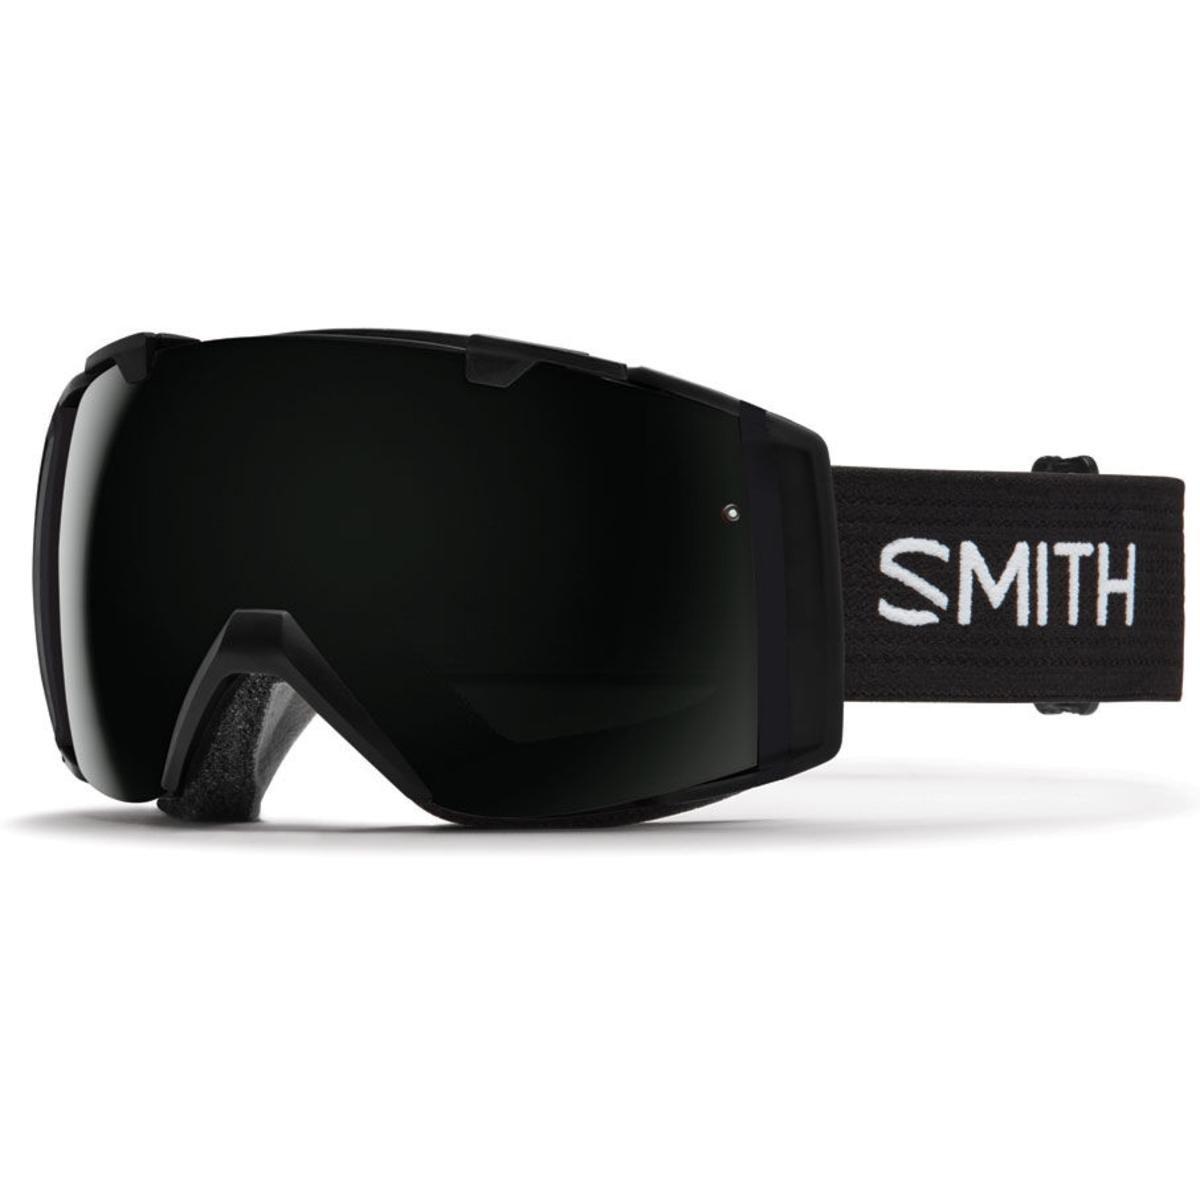 Smith Optics I/O Adult Snowmobile Goggles Black / Blackout by Smith Optics